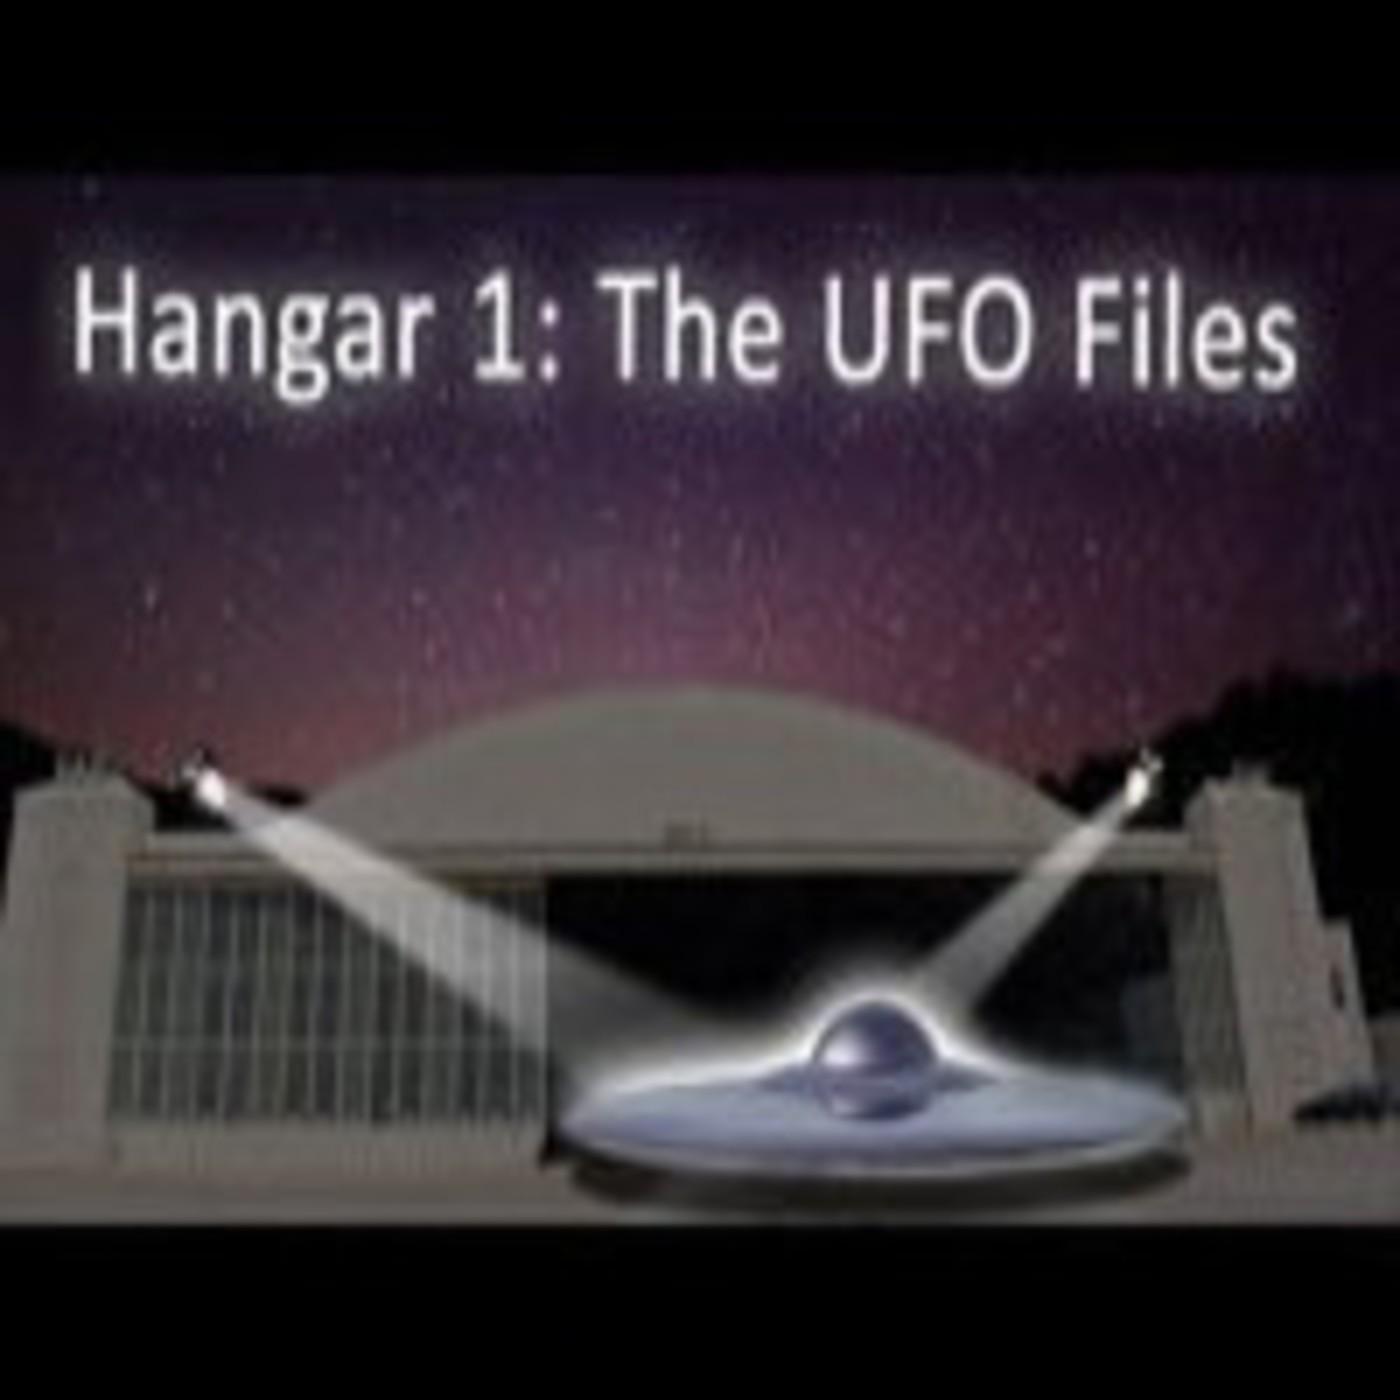 Hangar 1: Archivos extraterrestres (2014) -Serie completa-